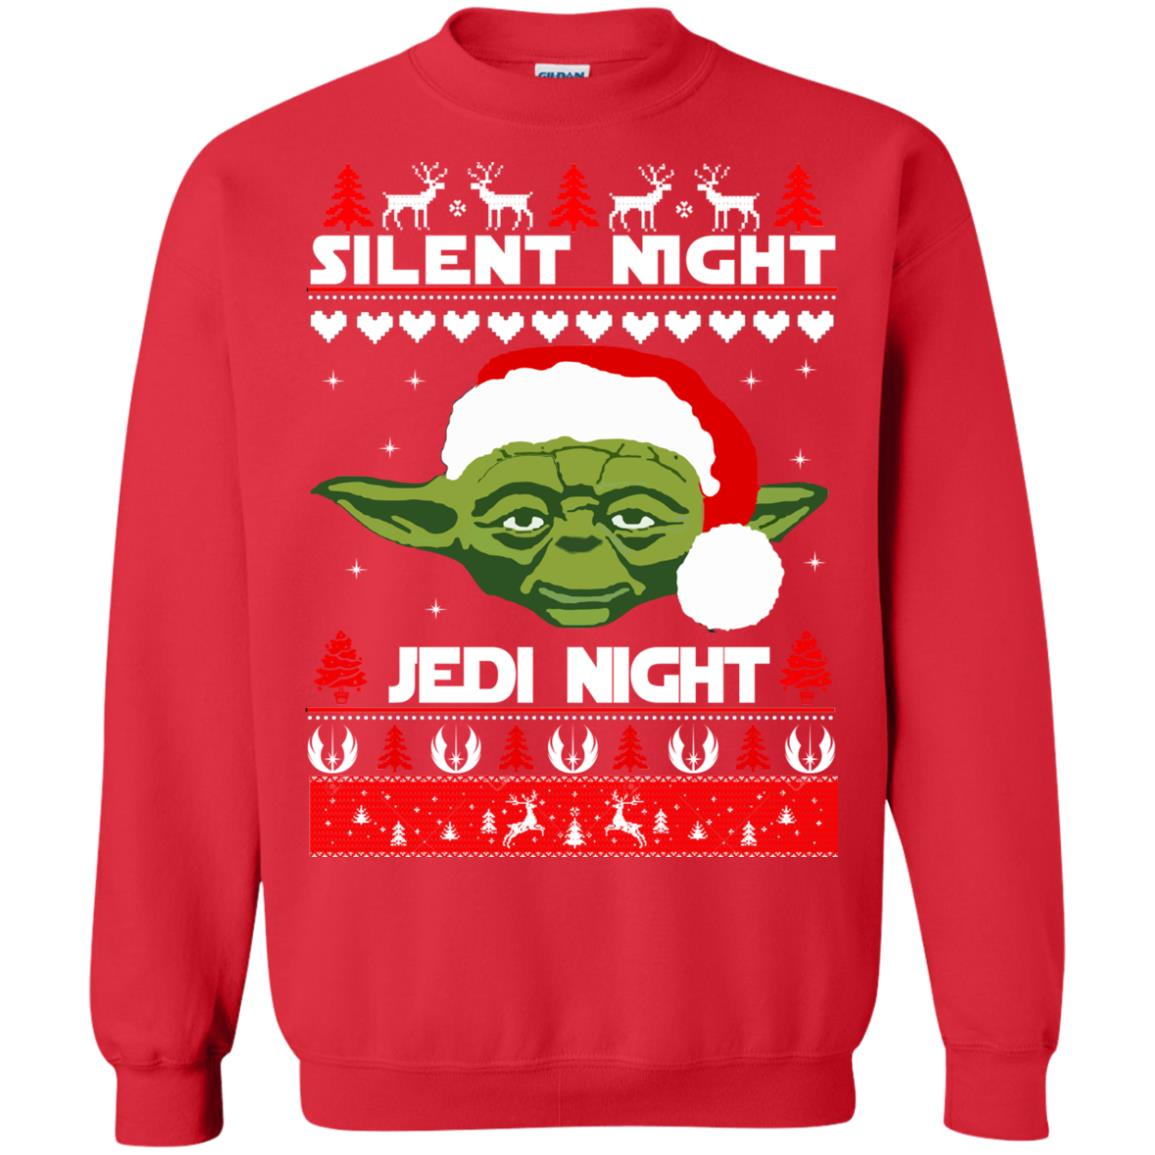 image 1718 - Yoda Star Wars: Silent Night Jedi Night Christmas Sweater, Hoodie